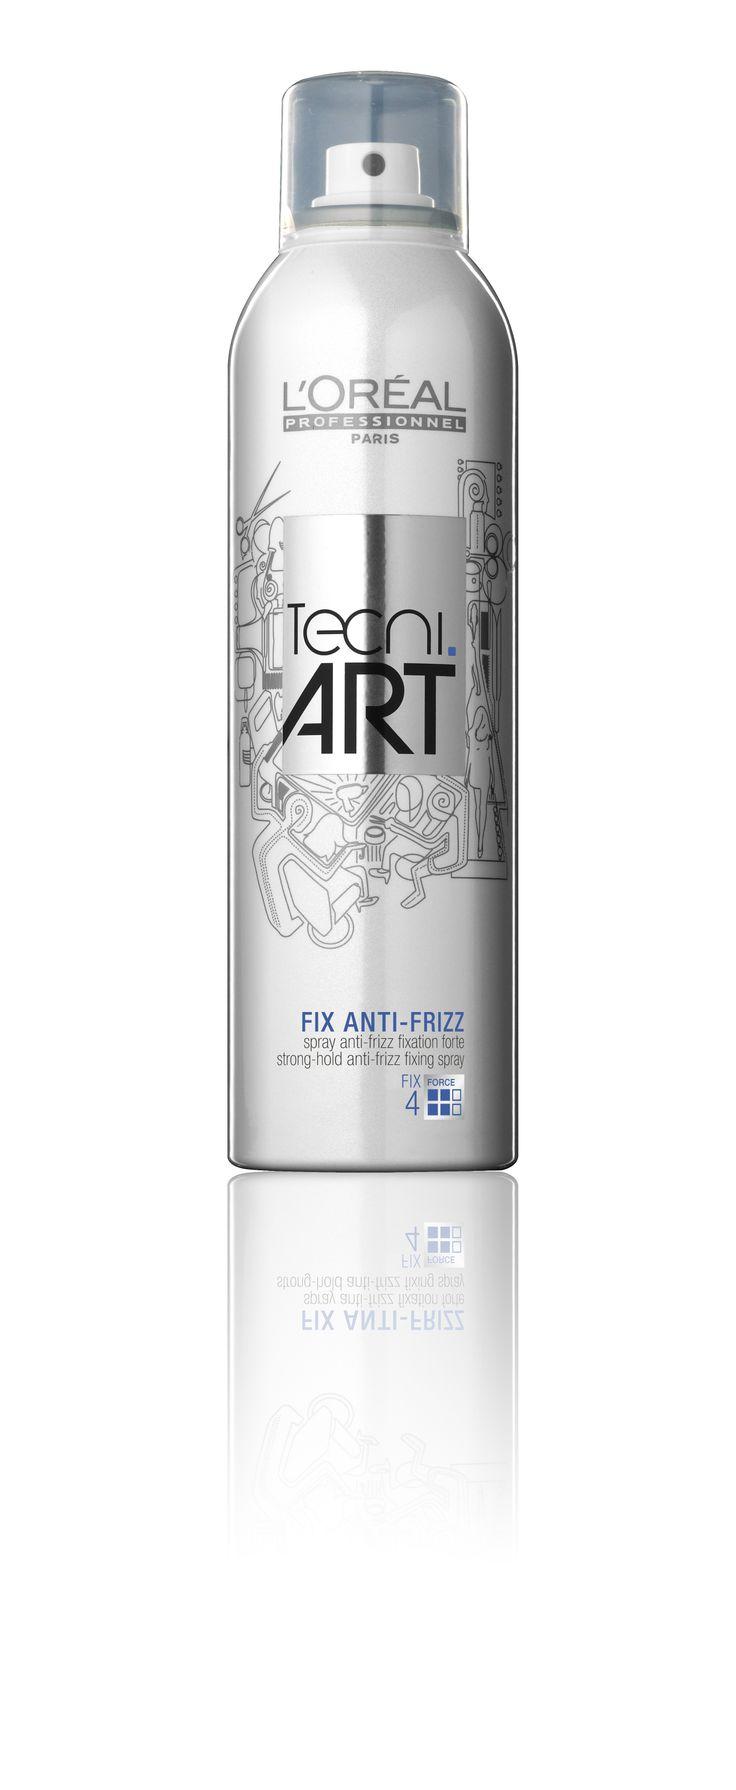 L'Oréal Professionnel Tecni.ART Fix - Fix Anti-Frizz strong hold anti-frizz fixing spray 240ml.